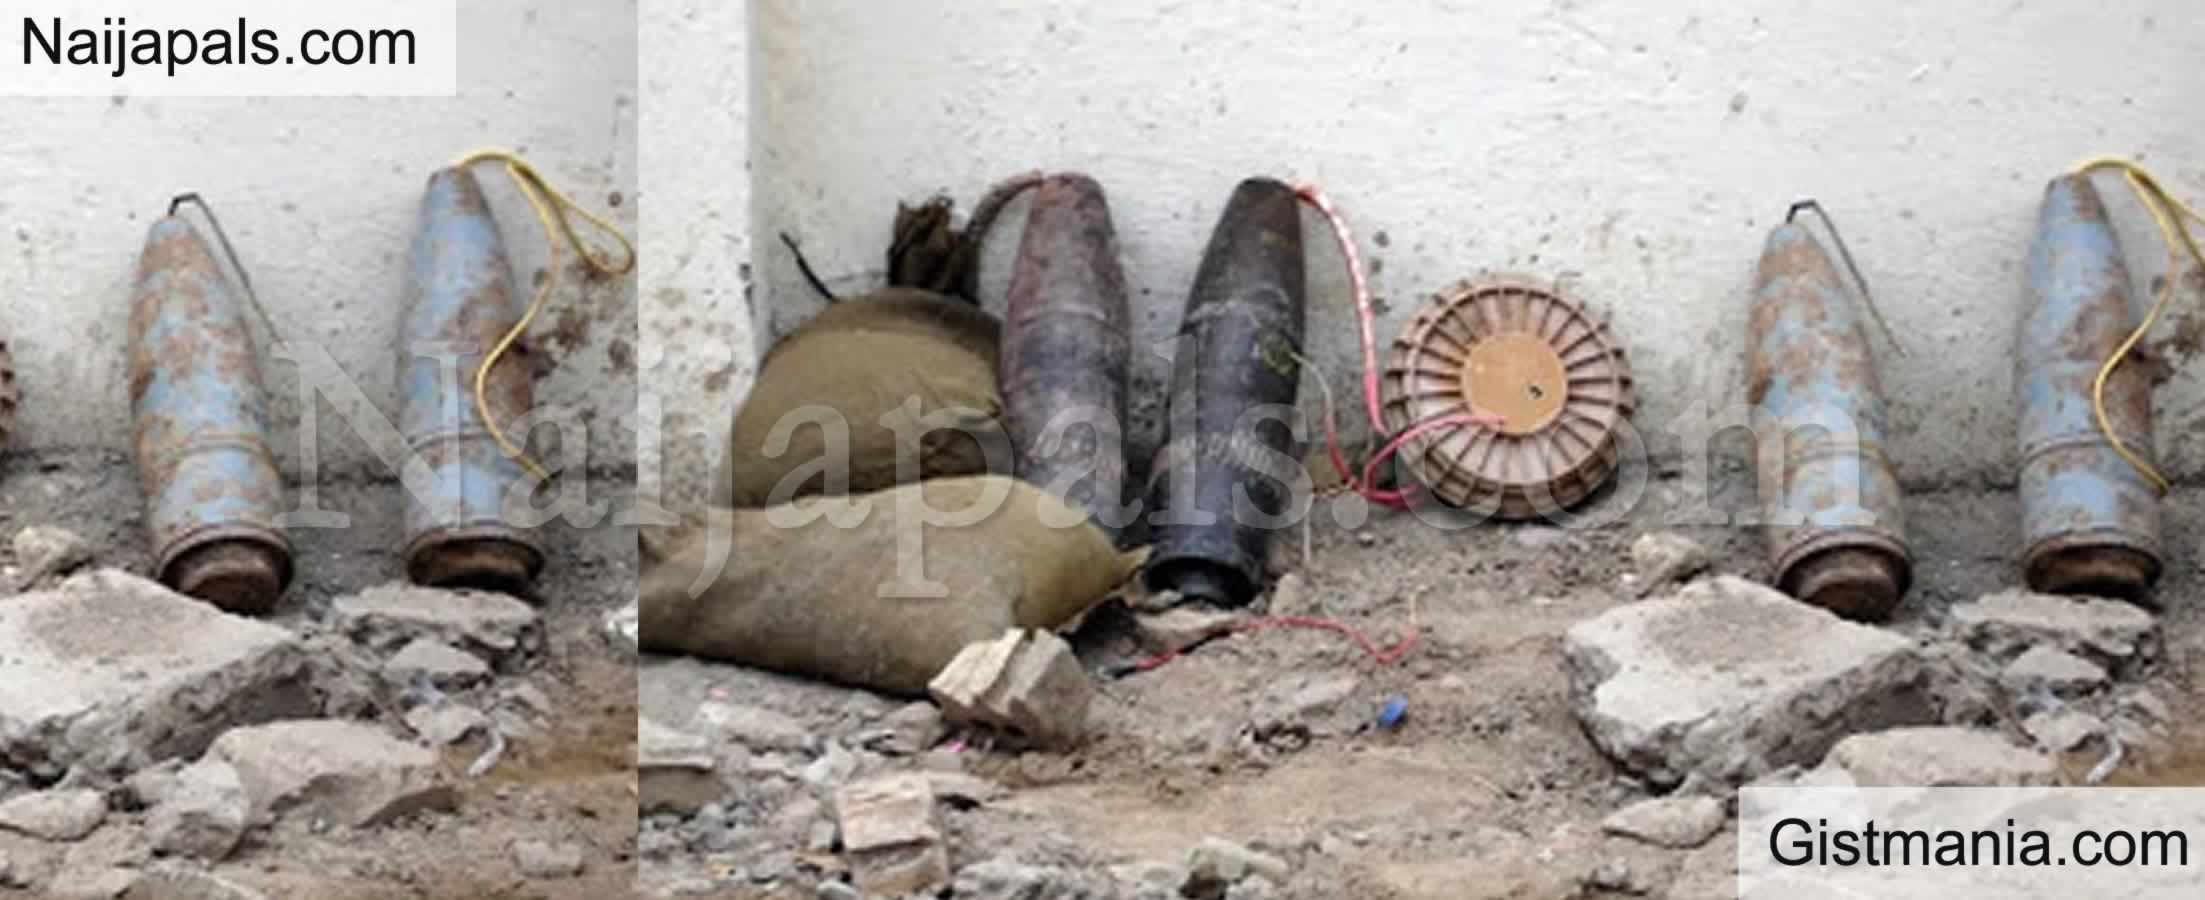 <img alt='.' class='lazyload' data-src='https://img.gistmania.com/emot/news.gif' /> <b>Panic As Nigerian Army Detonates Explosives At Cross River Barracks, Causing Explosions</b>